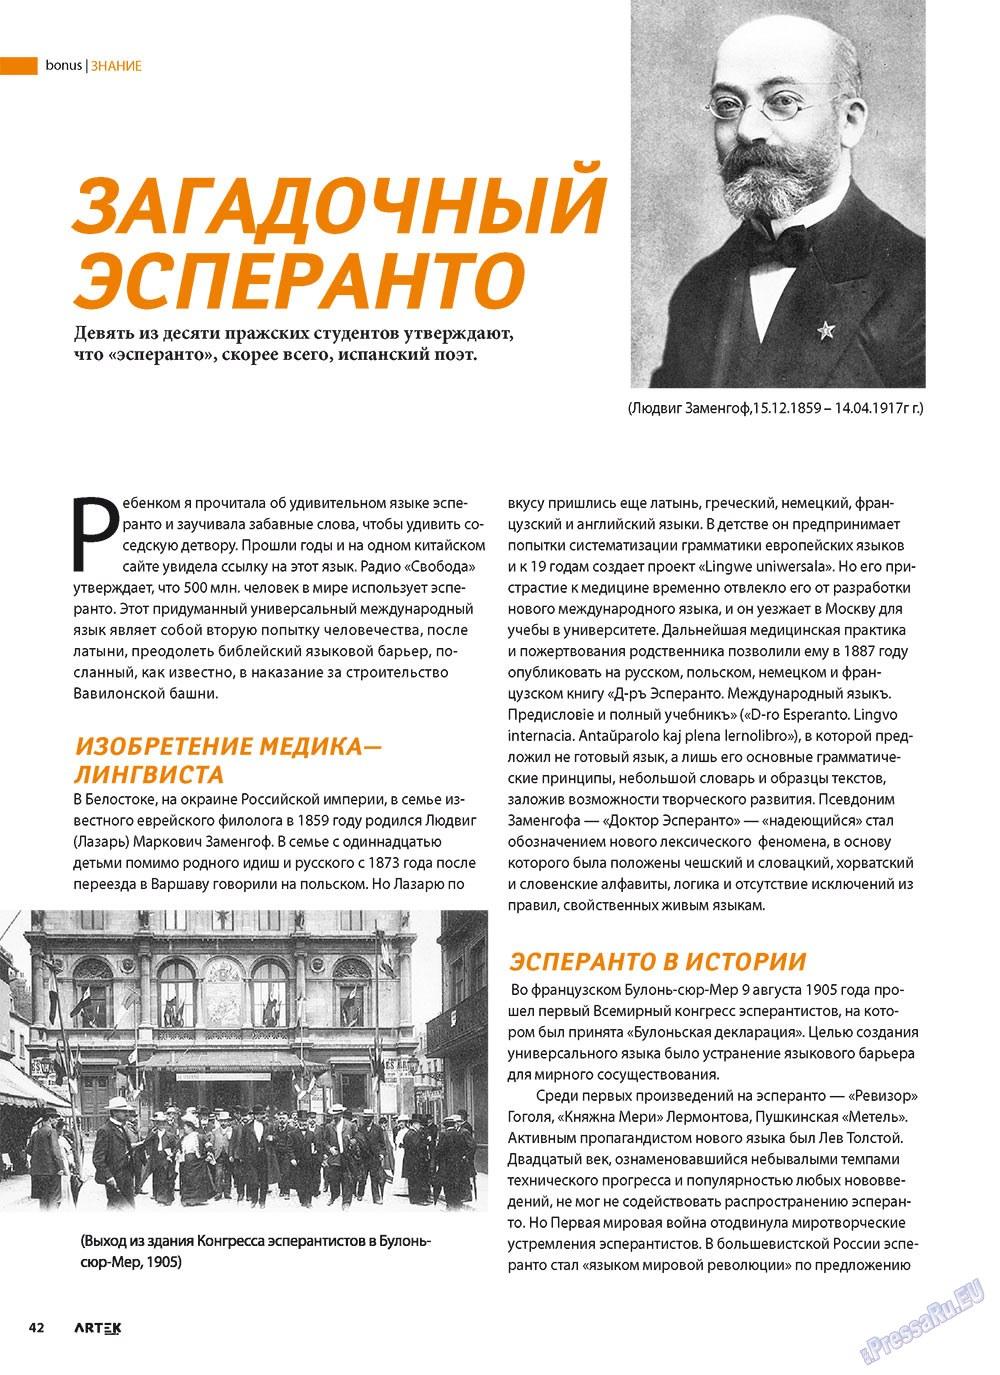 Артек (журнал). 2011 год, номер 1, стр. 44